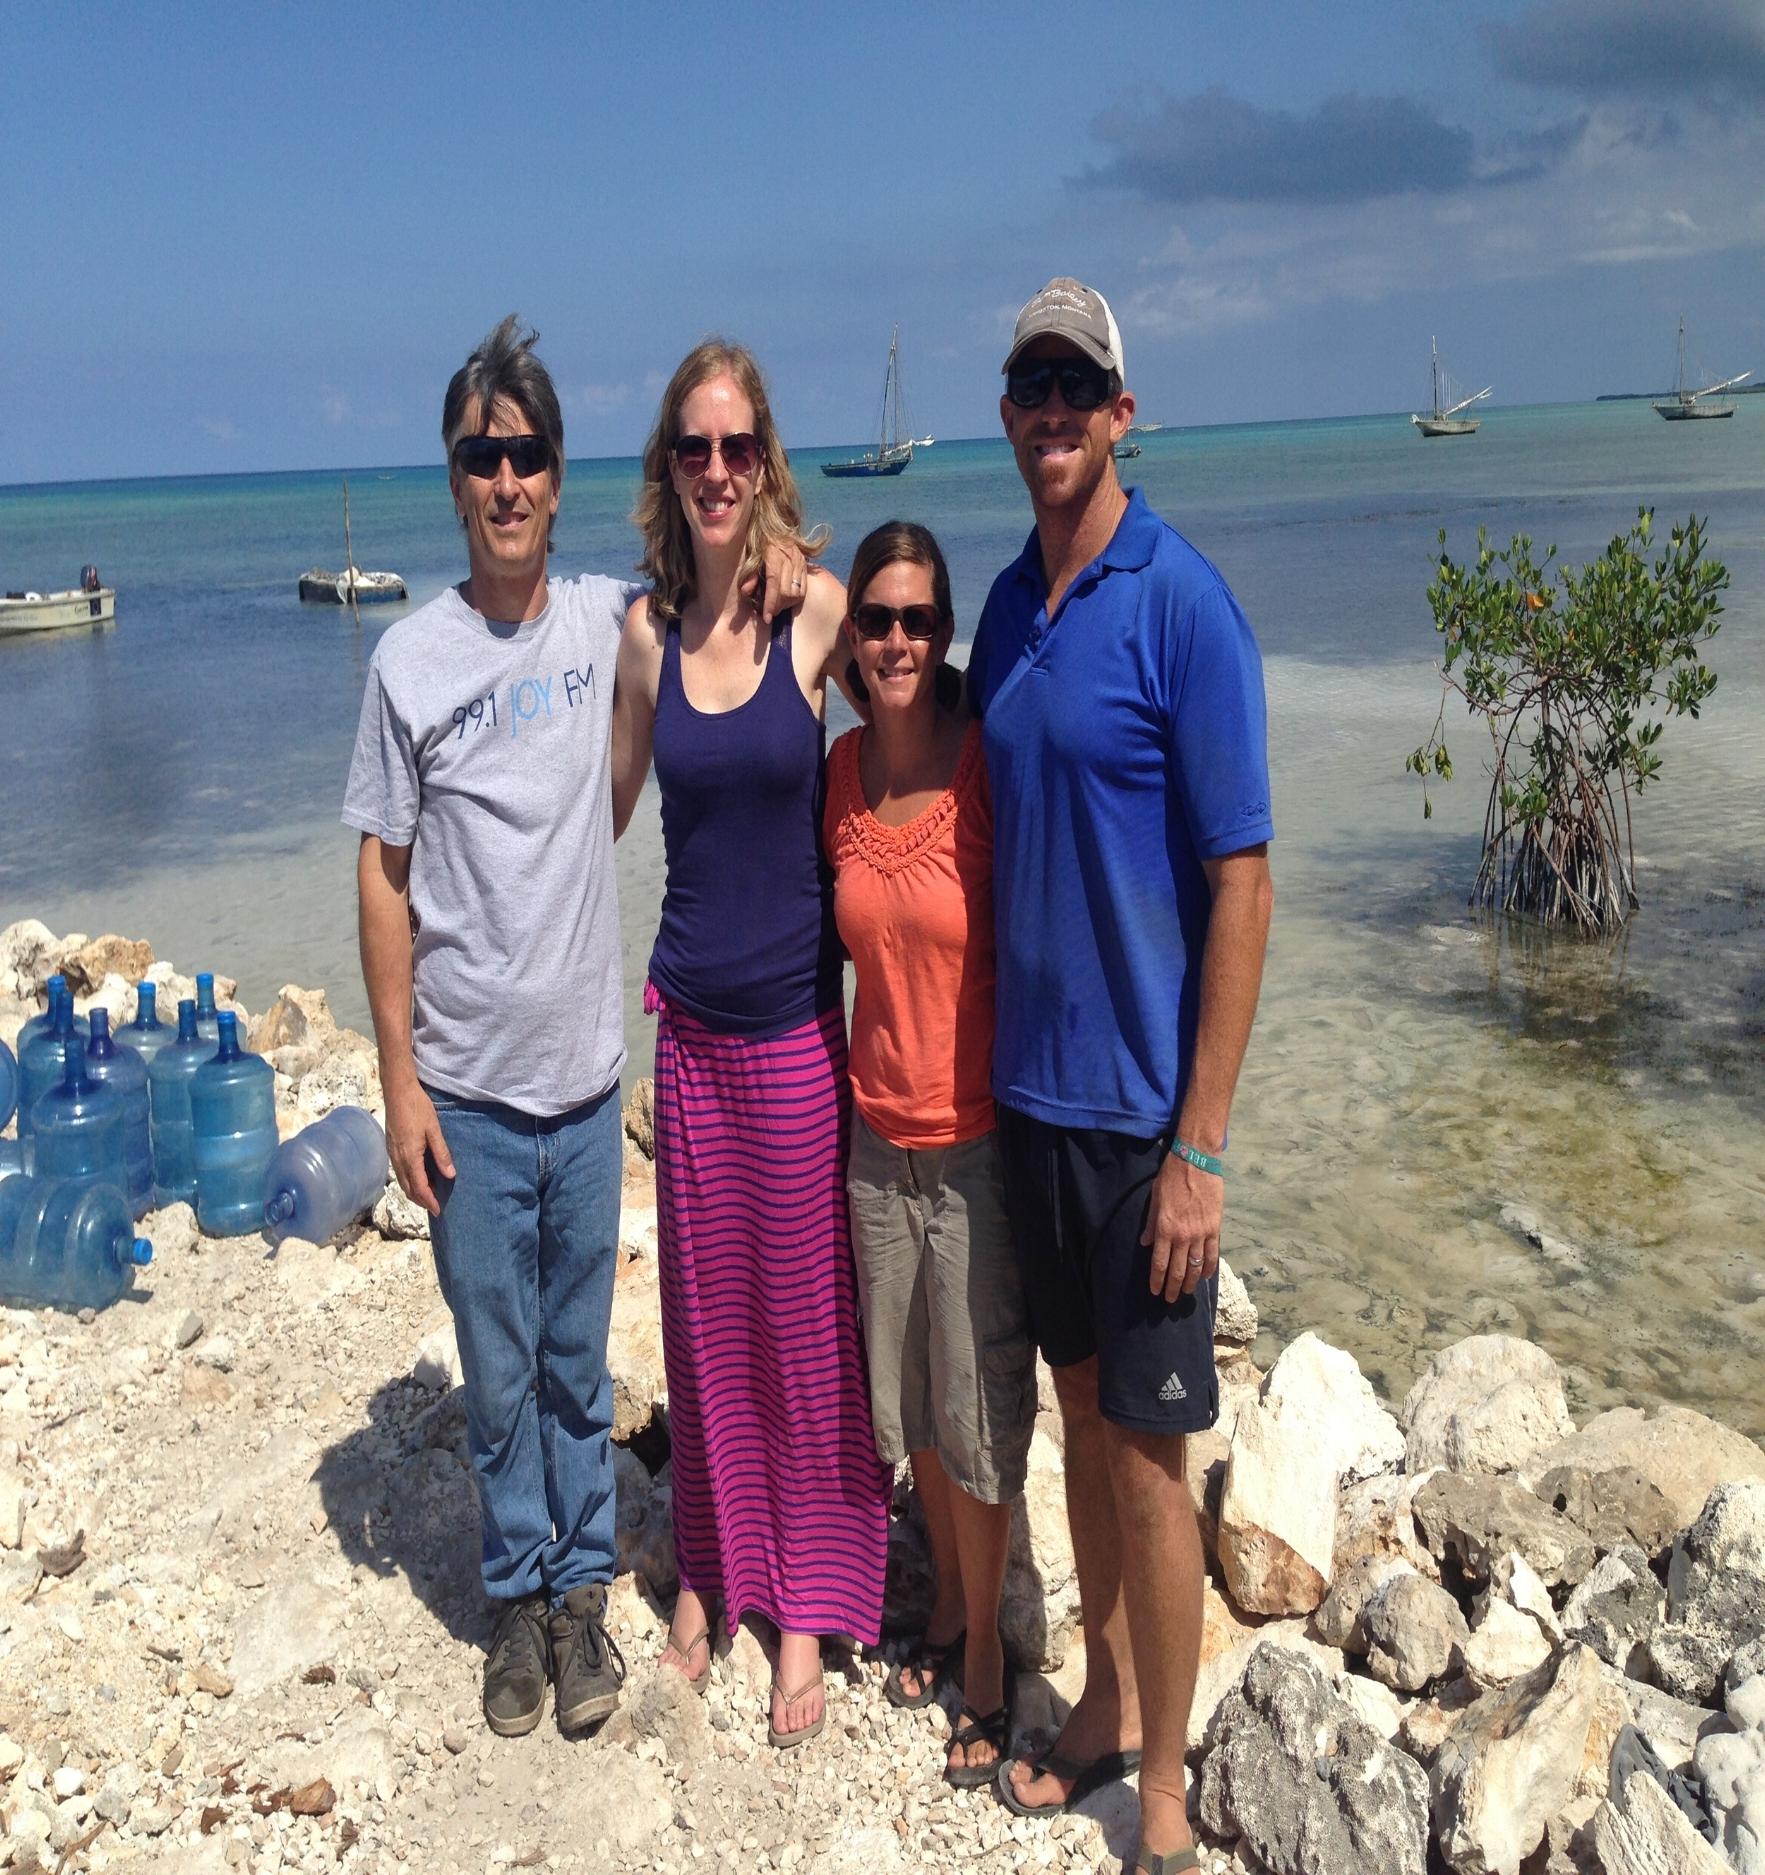 Randolph World Missions July 2016 Medical Mission Visit to Grand Vide